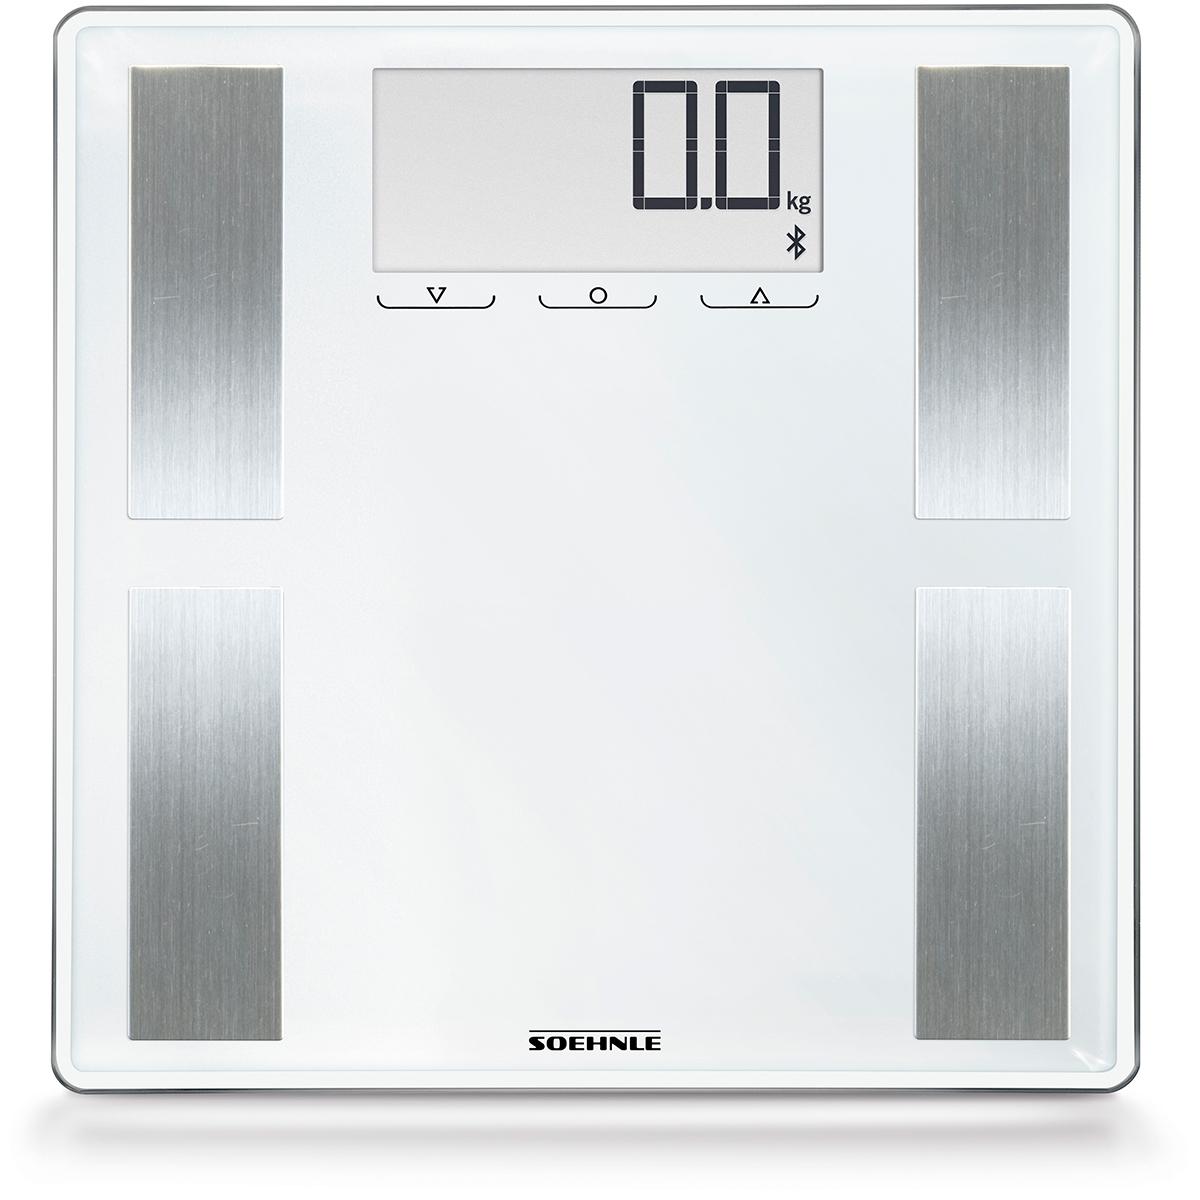 Image of   Soehnle badevægt med kropsanalyse - Shape Sense Connect 100